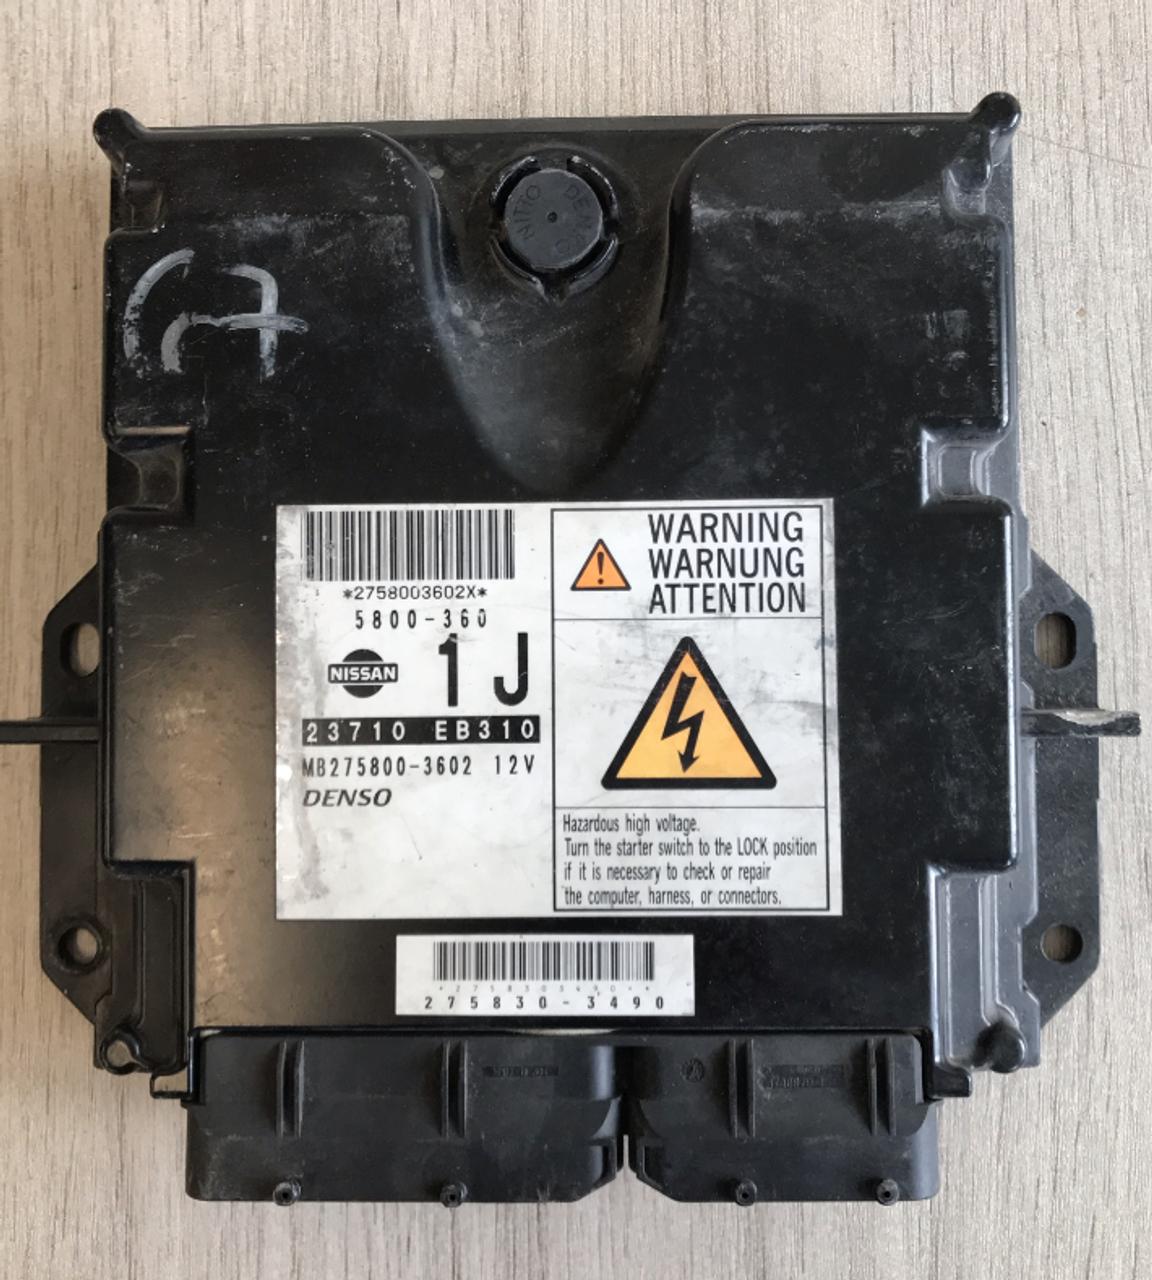 Denso Engine ECU, Nissan, 23710 EB310, MB275800-3602, 5800-360, 1J